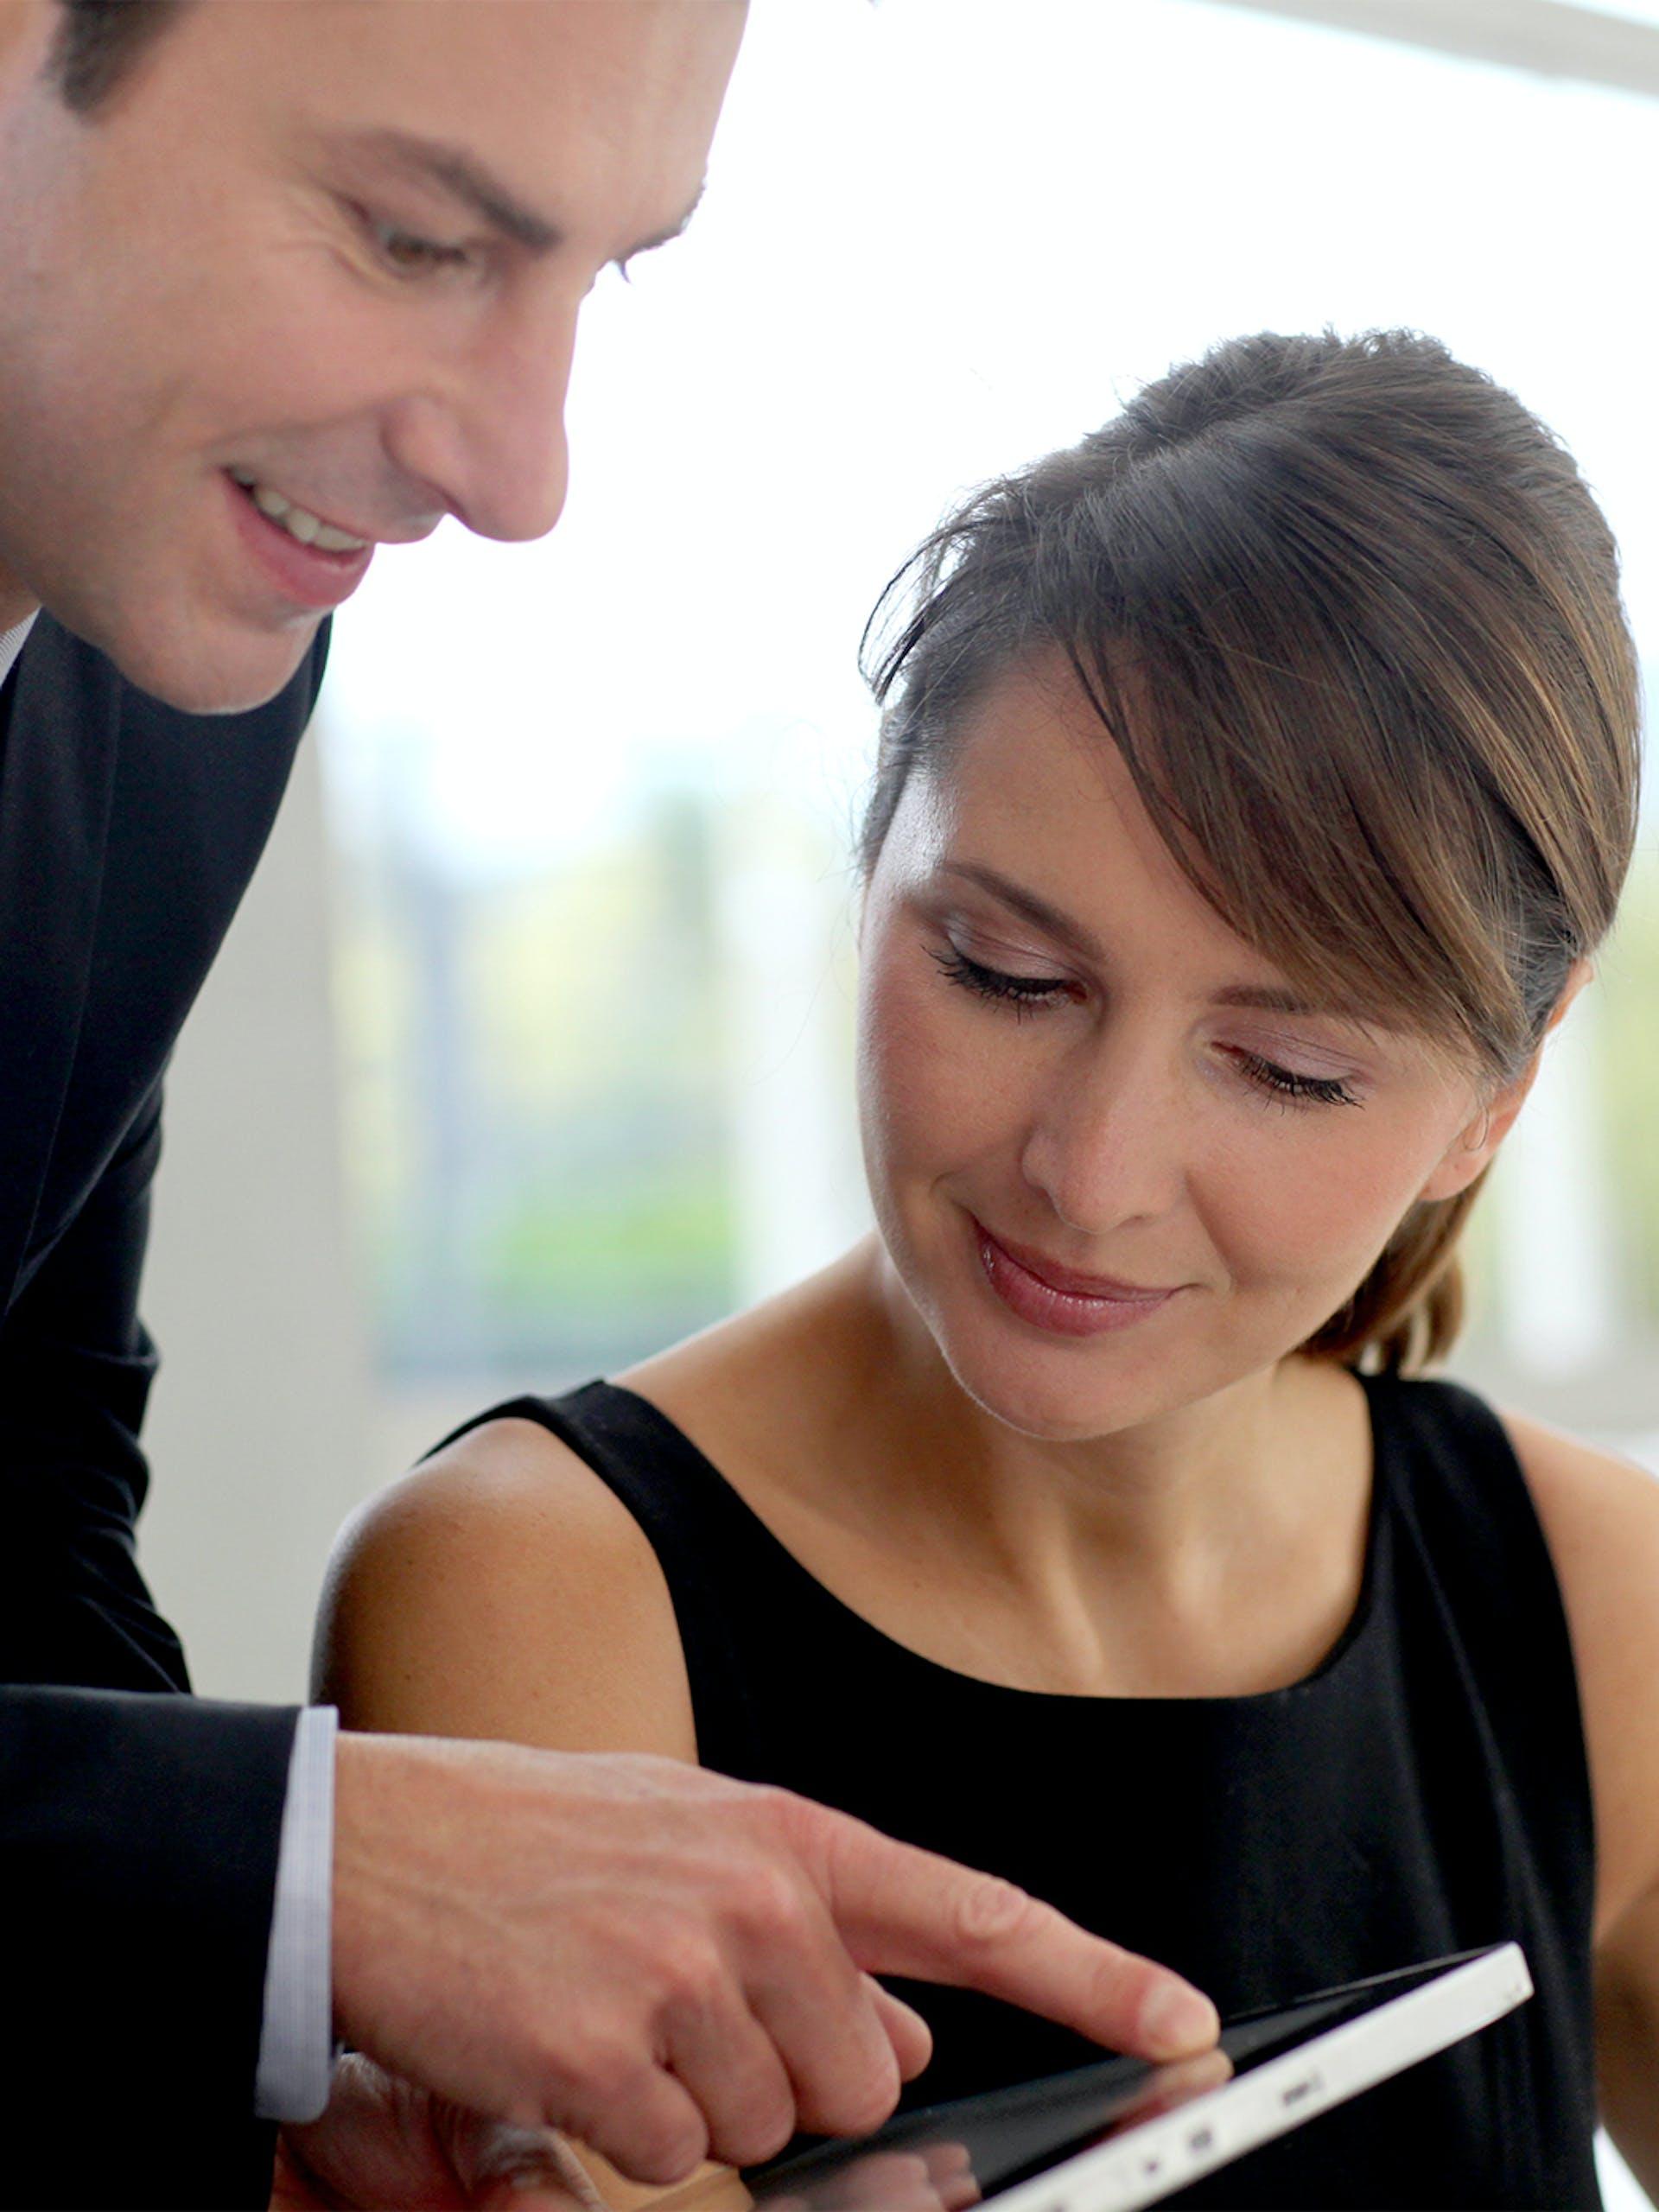 Man and woman looking at tablet.